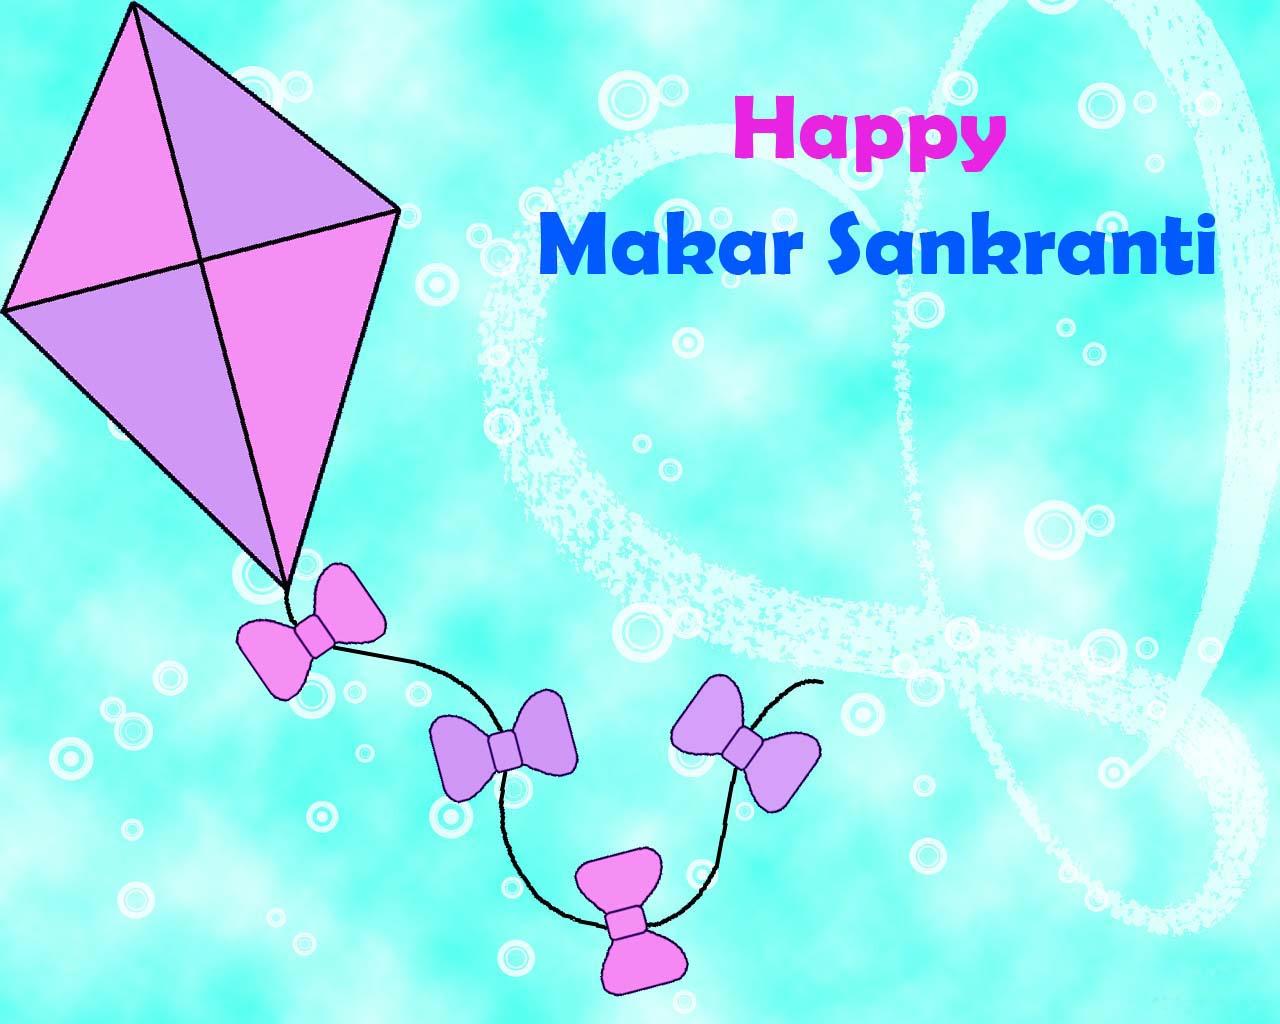 Happy Makar Sankranti And Happy Uttarayan Greetings Wishes Hd Best